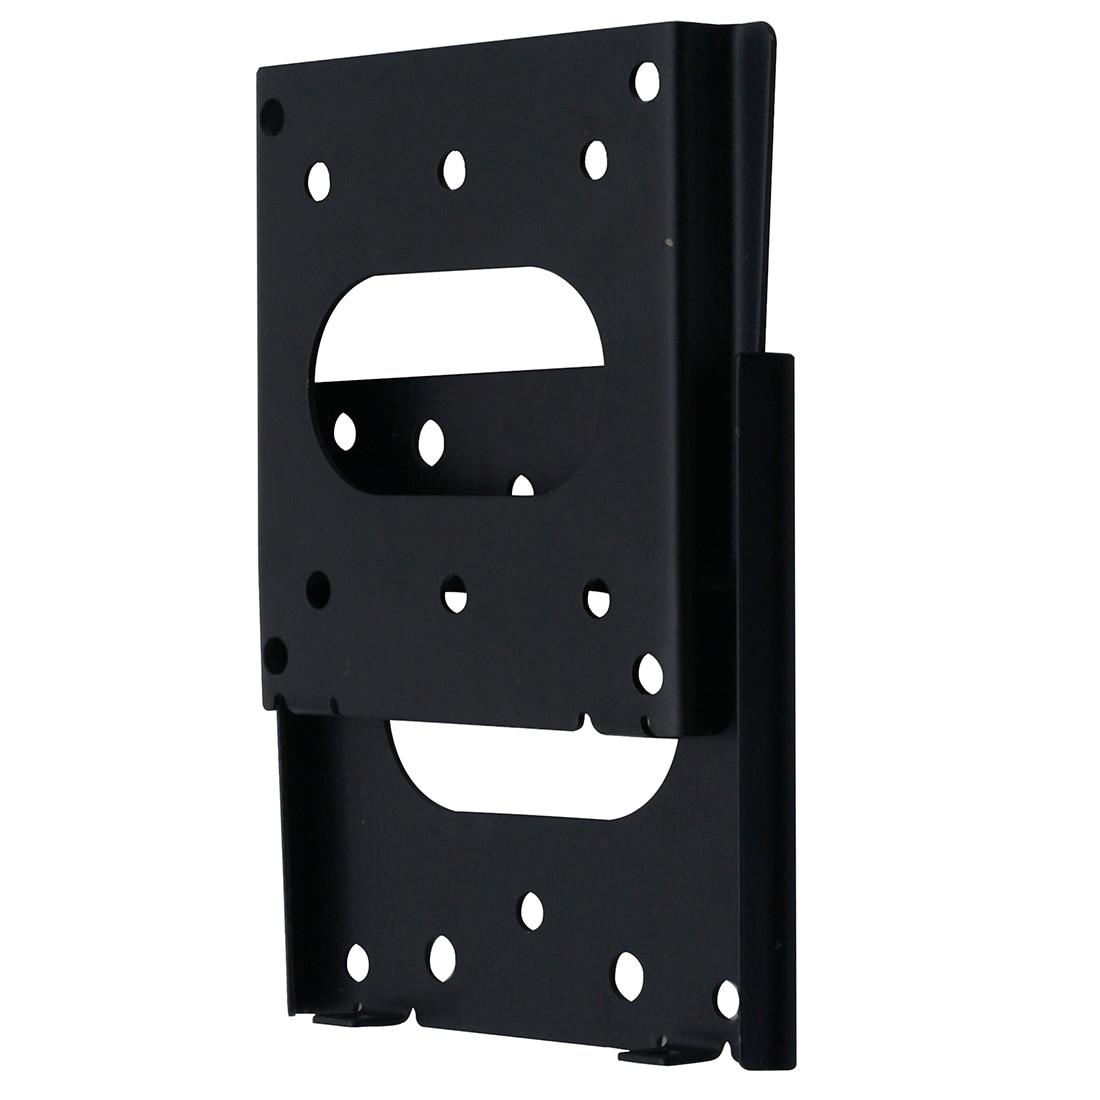 Plsama Ultra Slim Tilt Swivel TV wall mount bracket for 10-70 inch VESA 50-400mm ( 18 Ultra Slim 10-24 )Plsama Ultra Slim Tilt Swivel TV wall mount bracket for 10-70 inch VESA 50-400mm ( 18 Ultra Slim 10-24 )